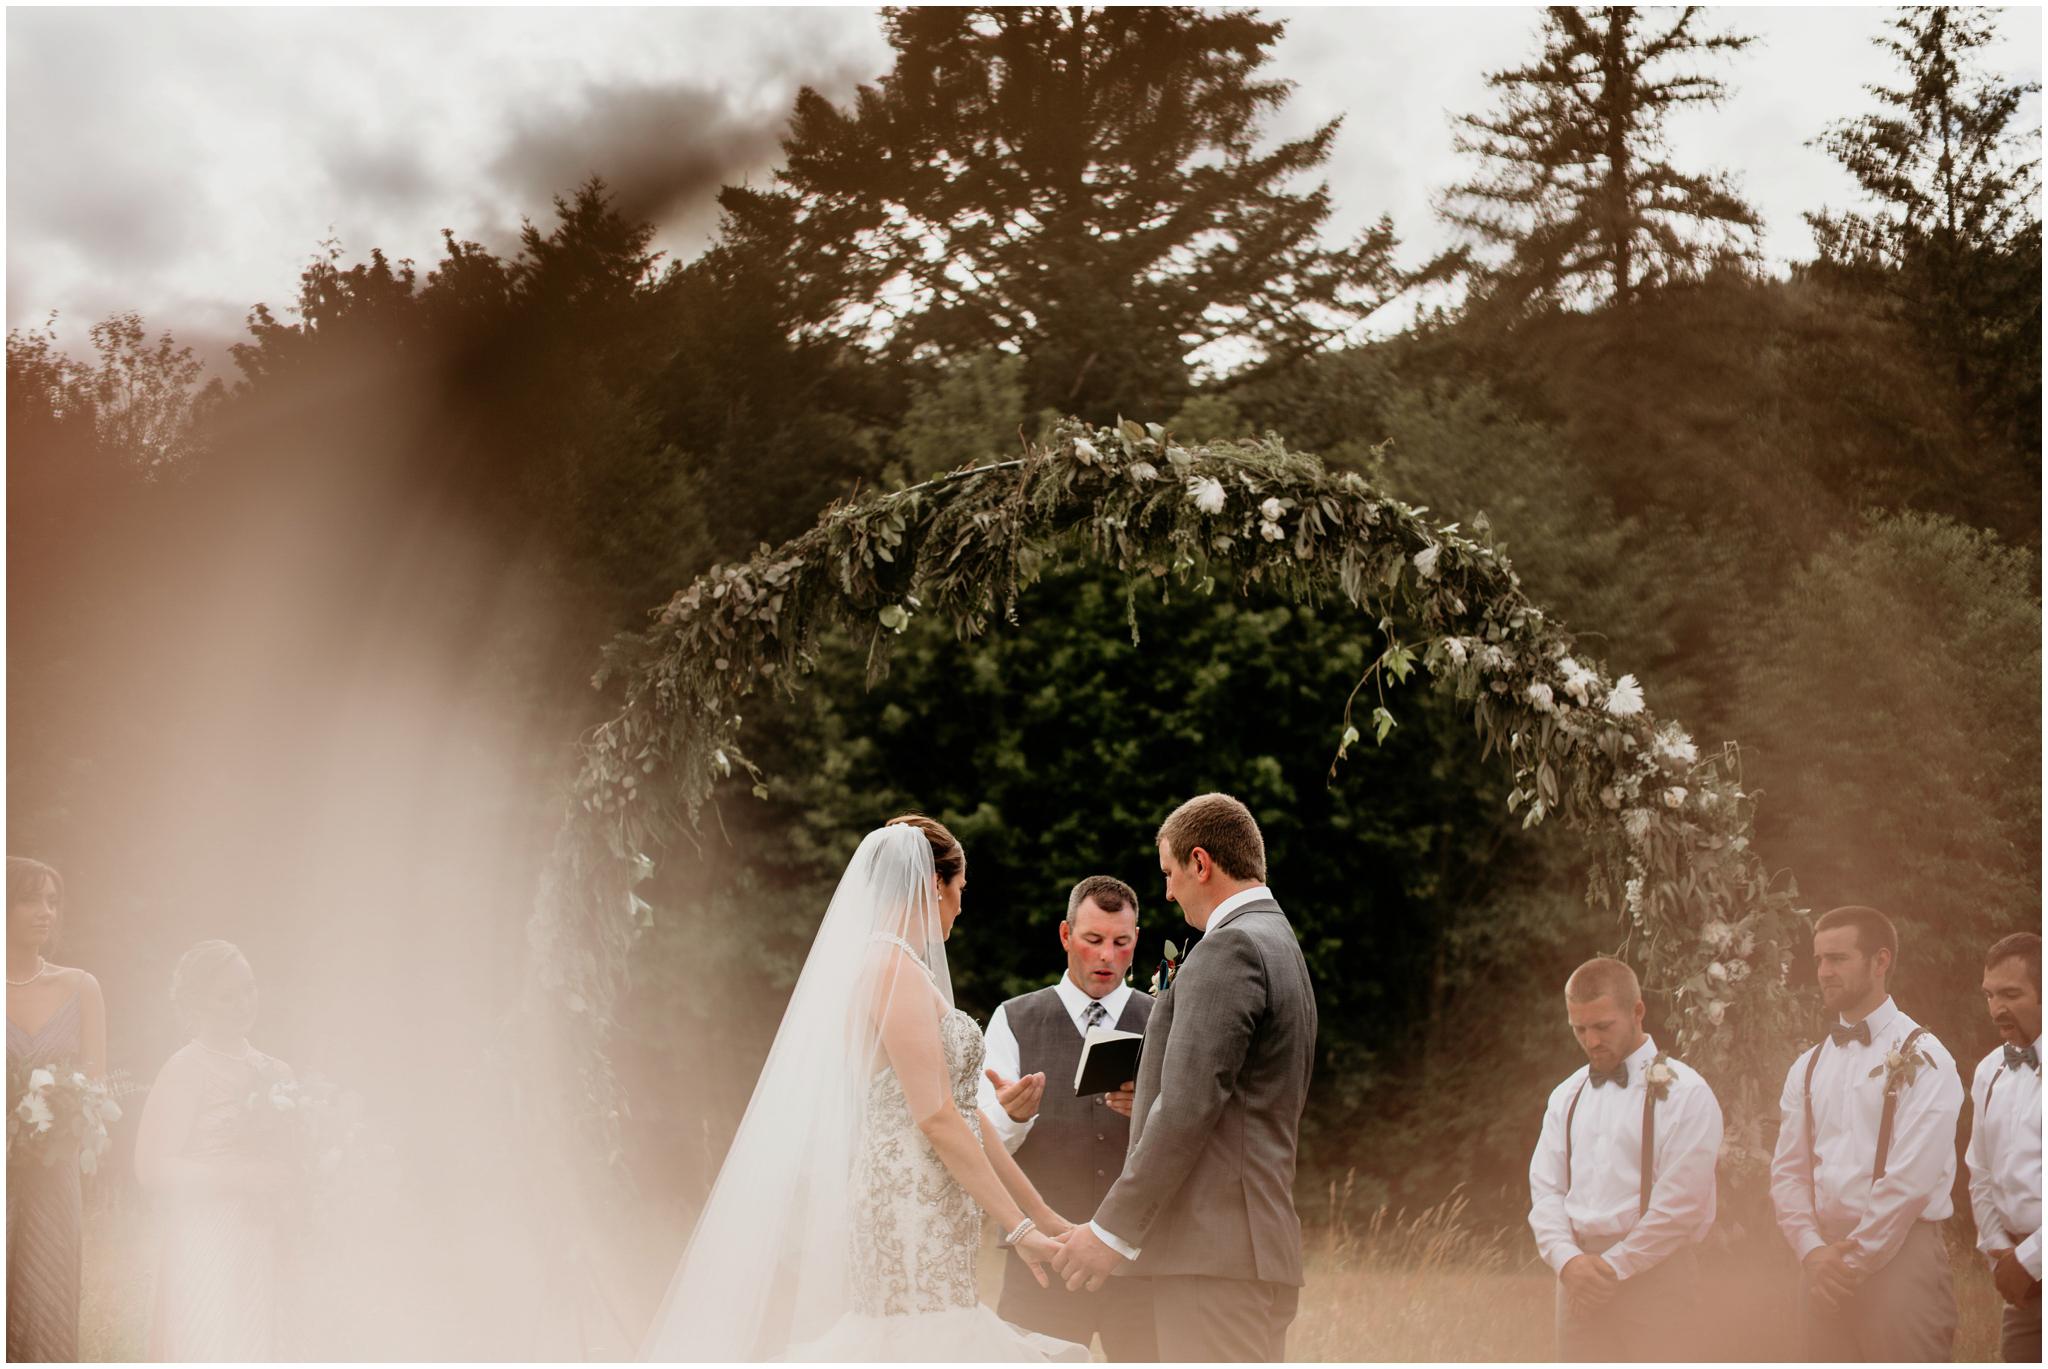 alex-and-matthew-three-cs-farm-venue-seattle-wedding-photographer-104.jpg